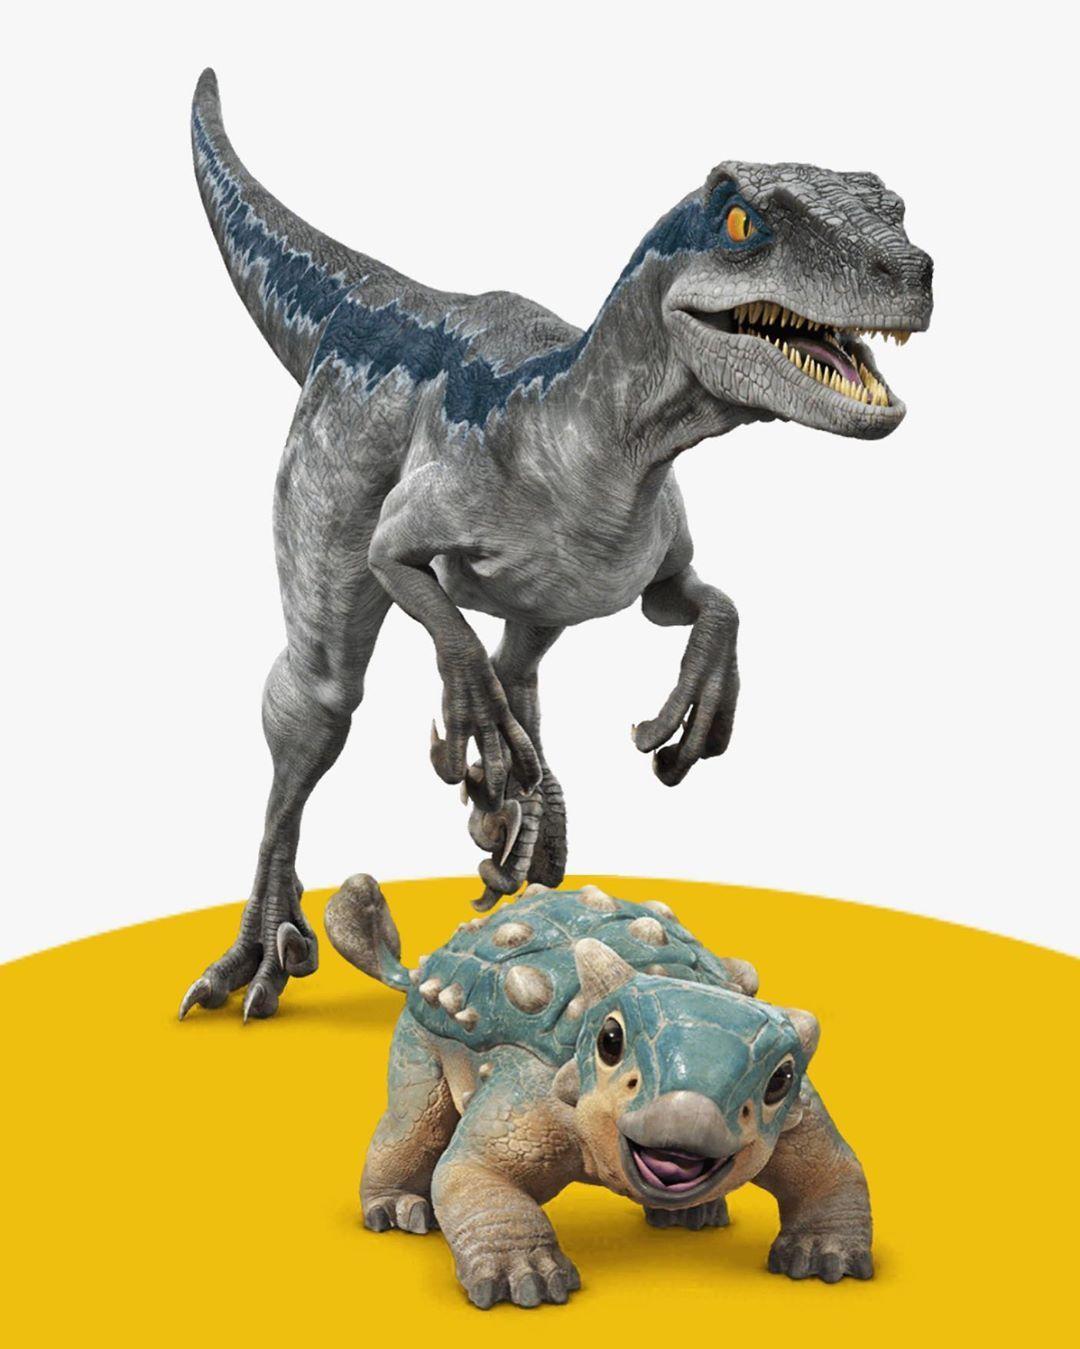 Jurassic Your World S Instagram Post Bumpy Blue Campcretaceous Blue Jurassic World Jurassic Park Poster Jurassic World Dinosaurs